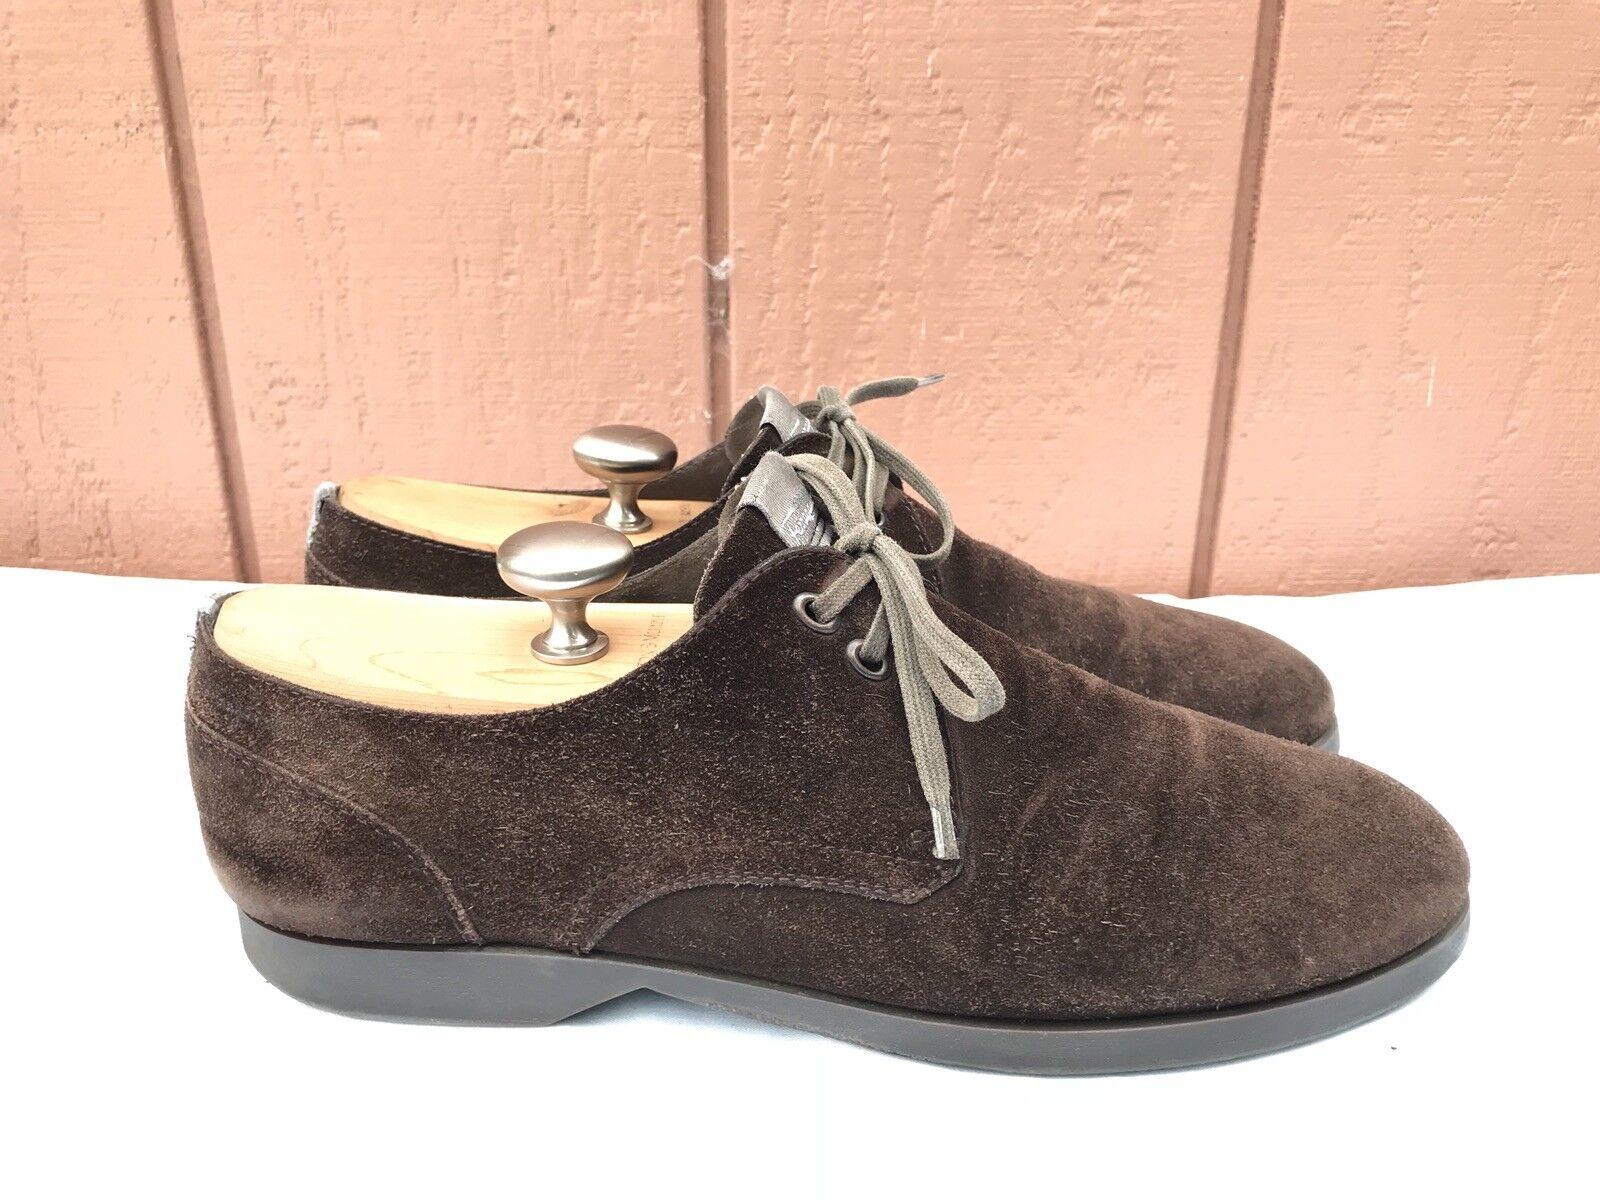 Men's Salvatore Ferragamo Größe US 9.5 EE Suede braun Leather Lace Up schuhe A8